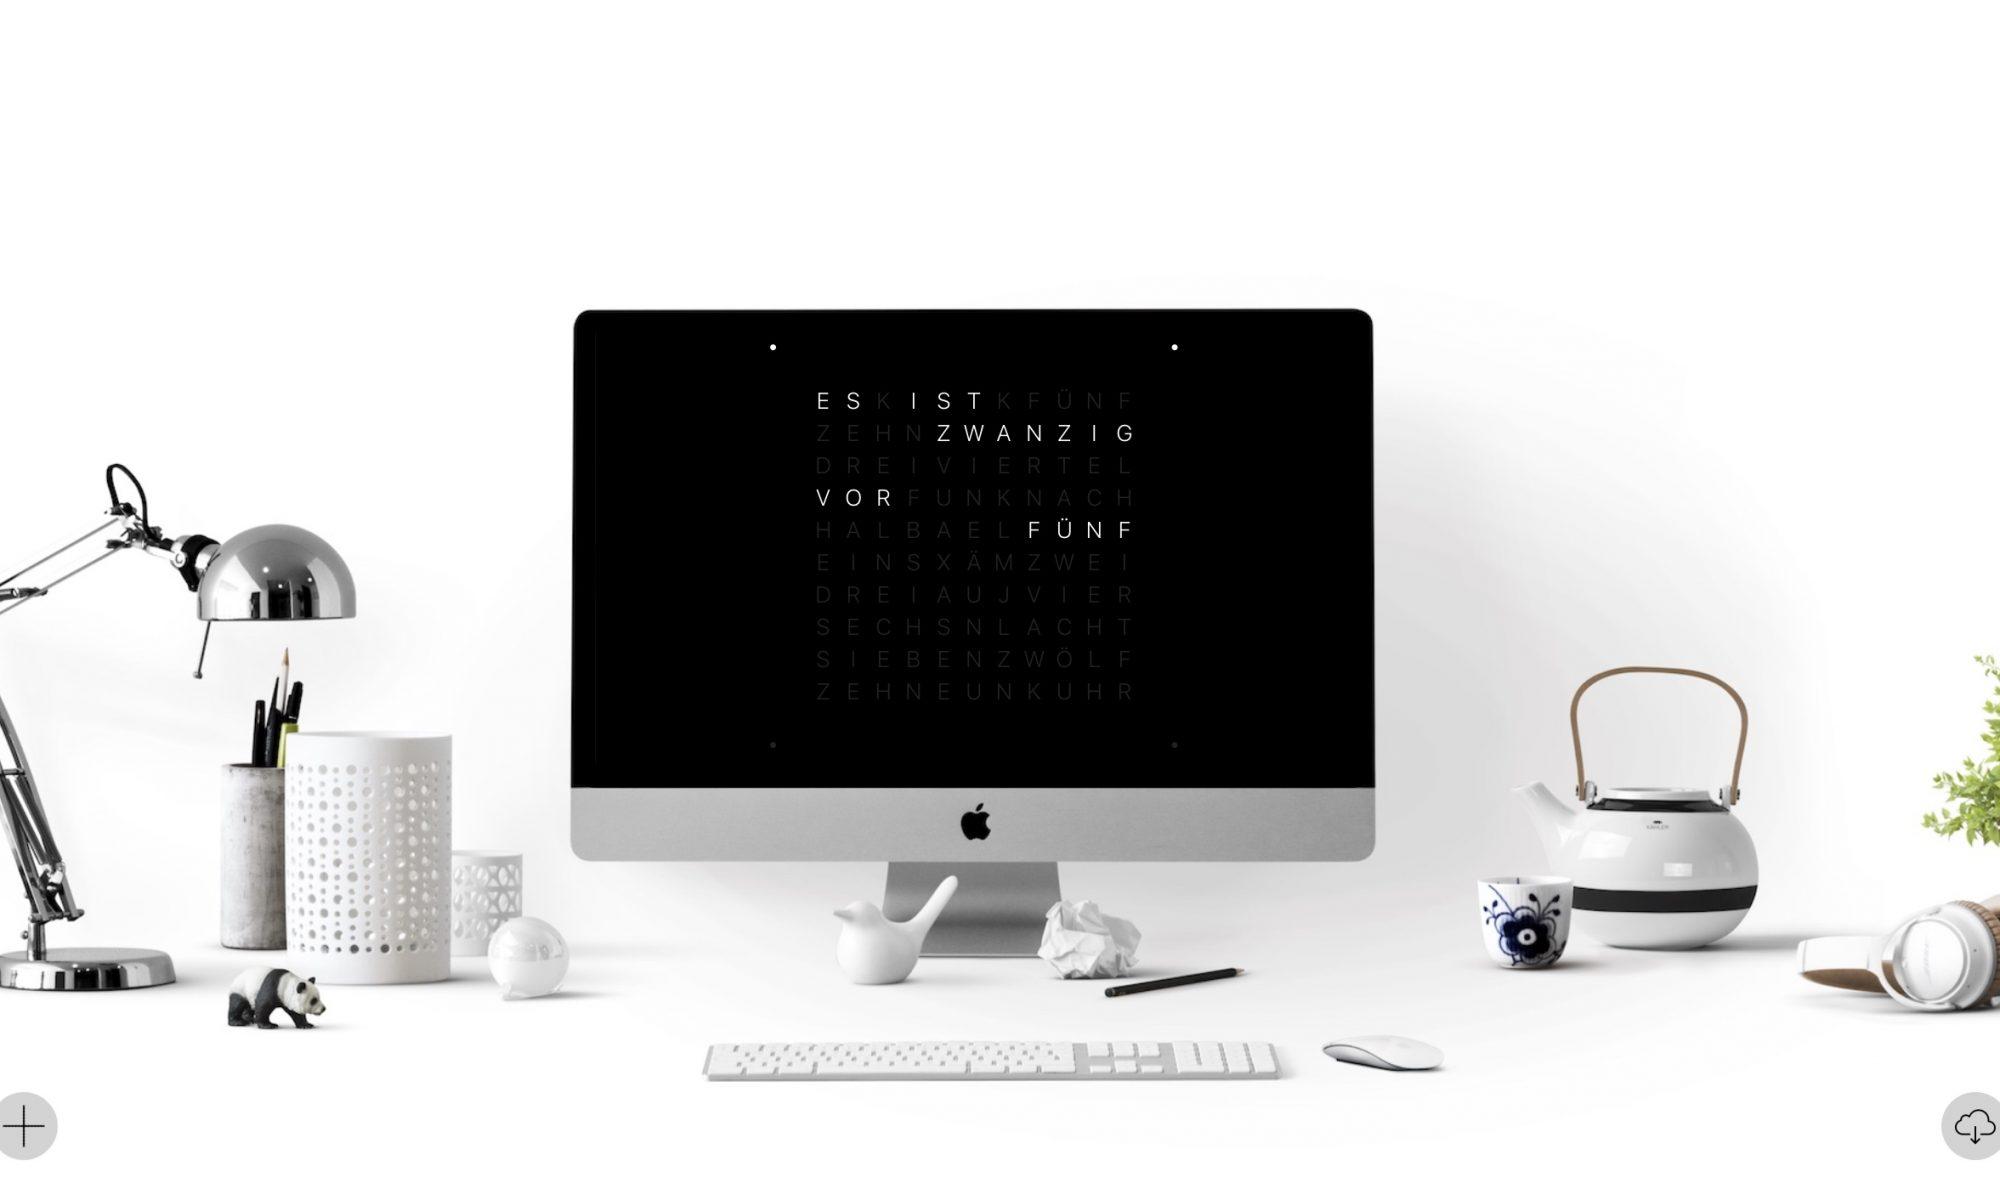 QlockTwo Screensaver on iMac